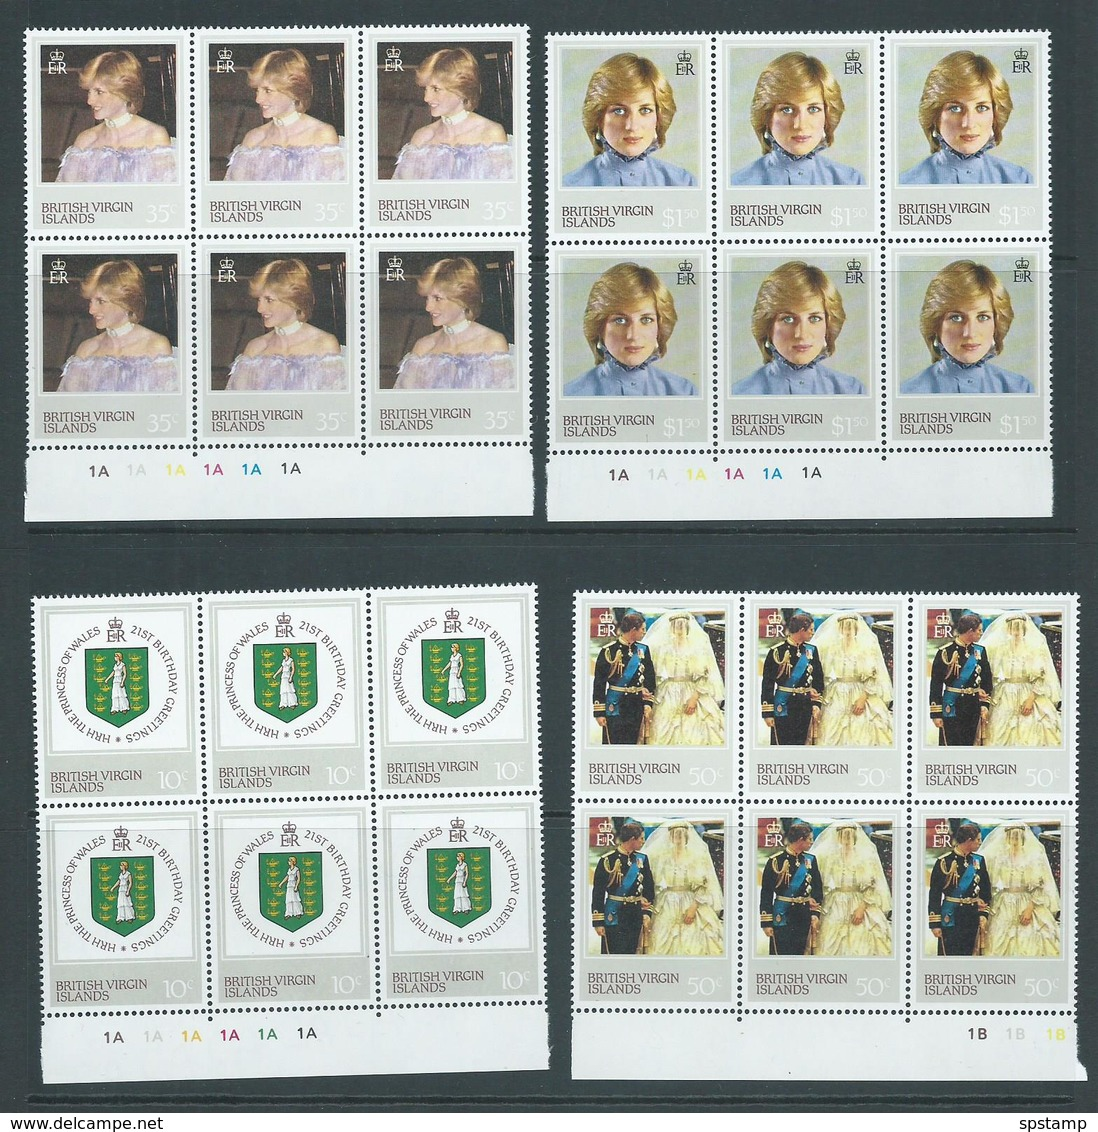 British Virgin Islands 1982 Princess Diana 21st Birthday Set 4 Plate Number Blocks Of 6 MNH - British Virgin Islands